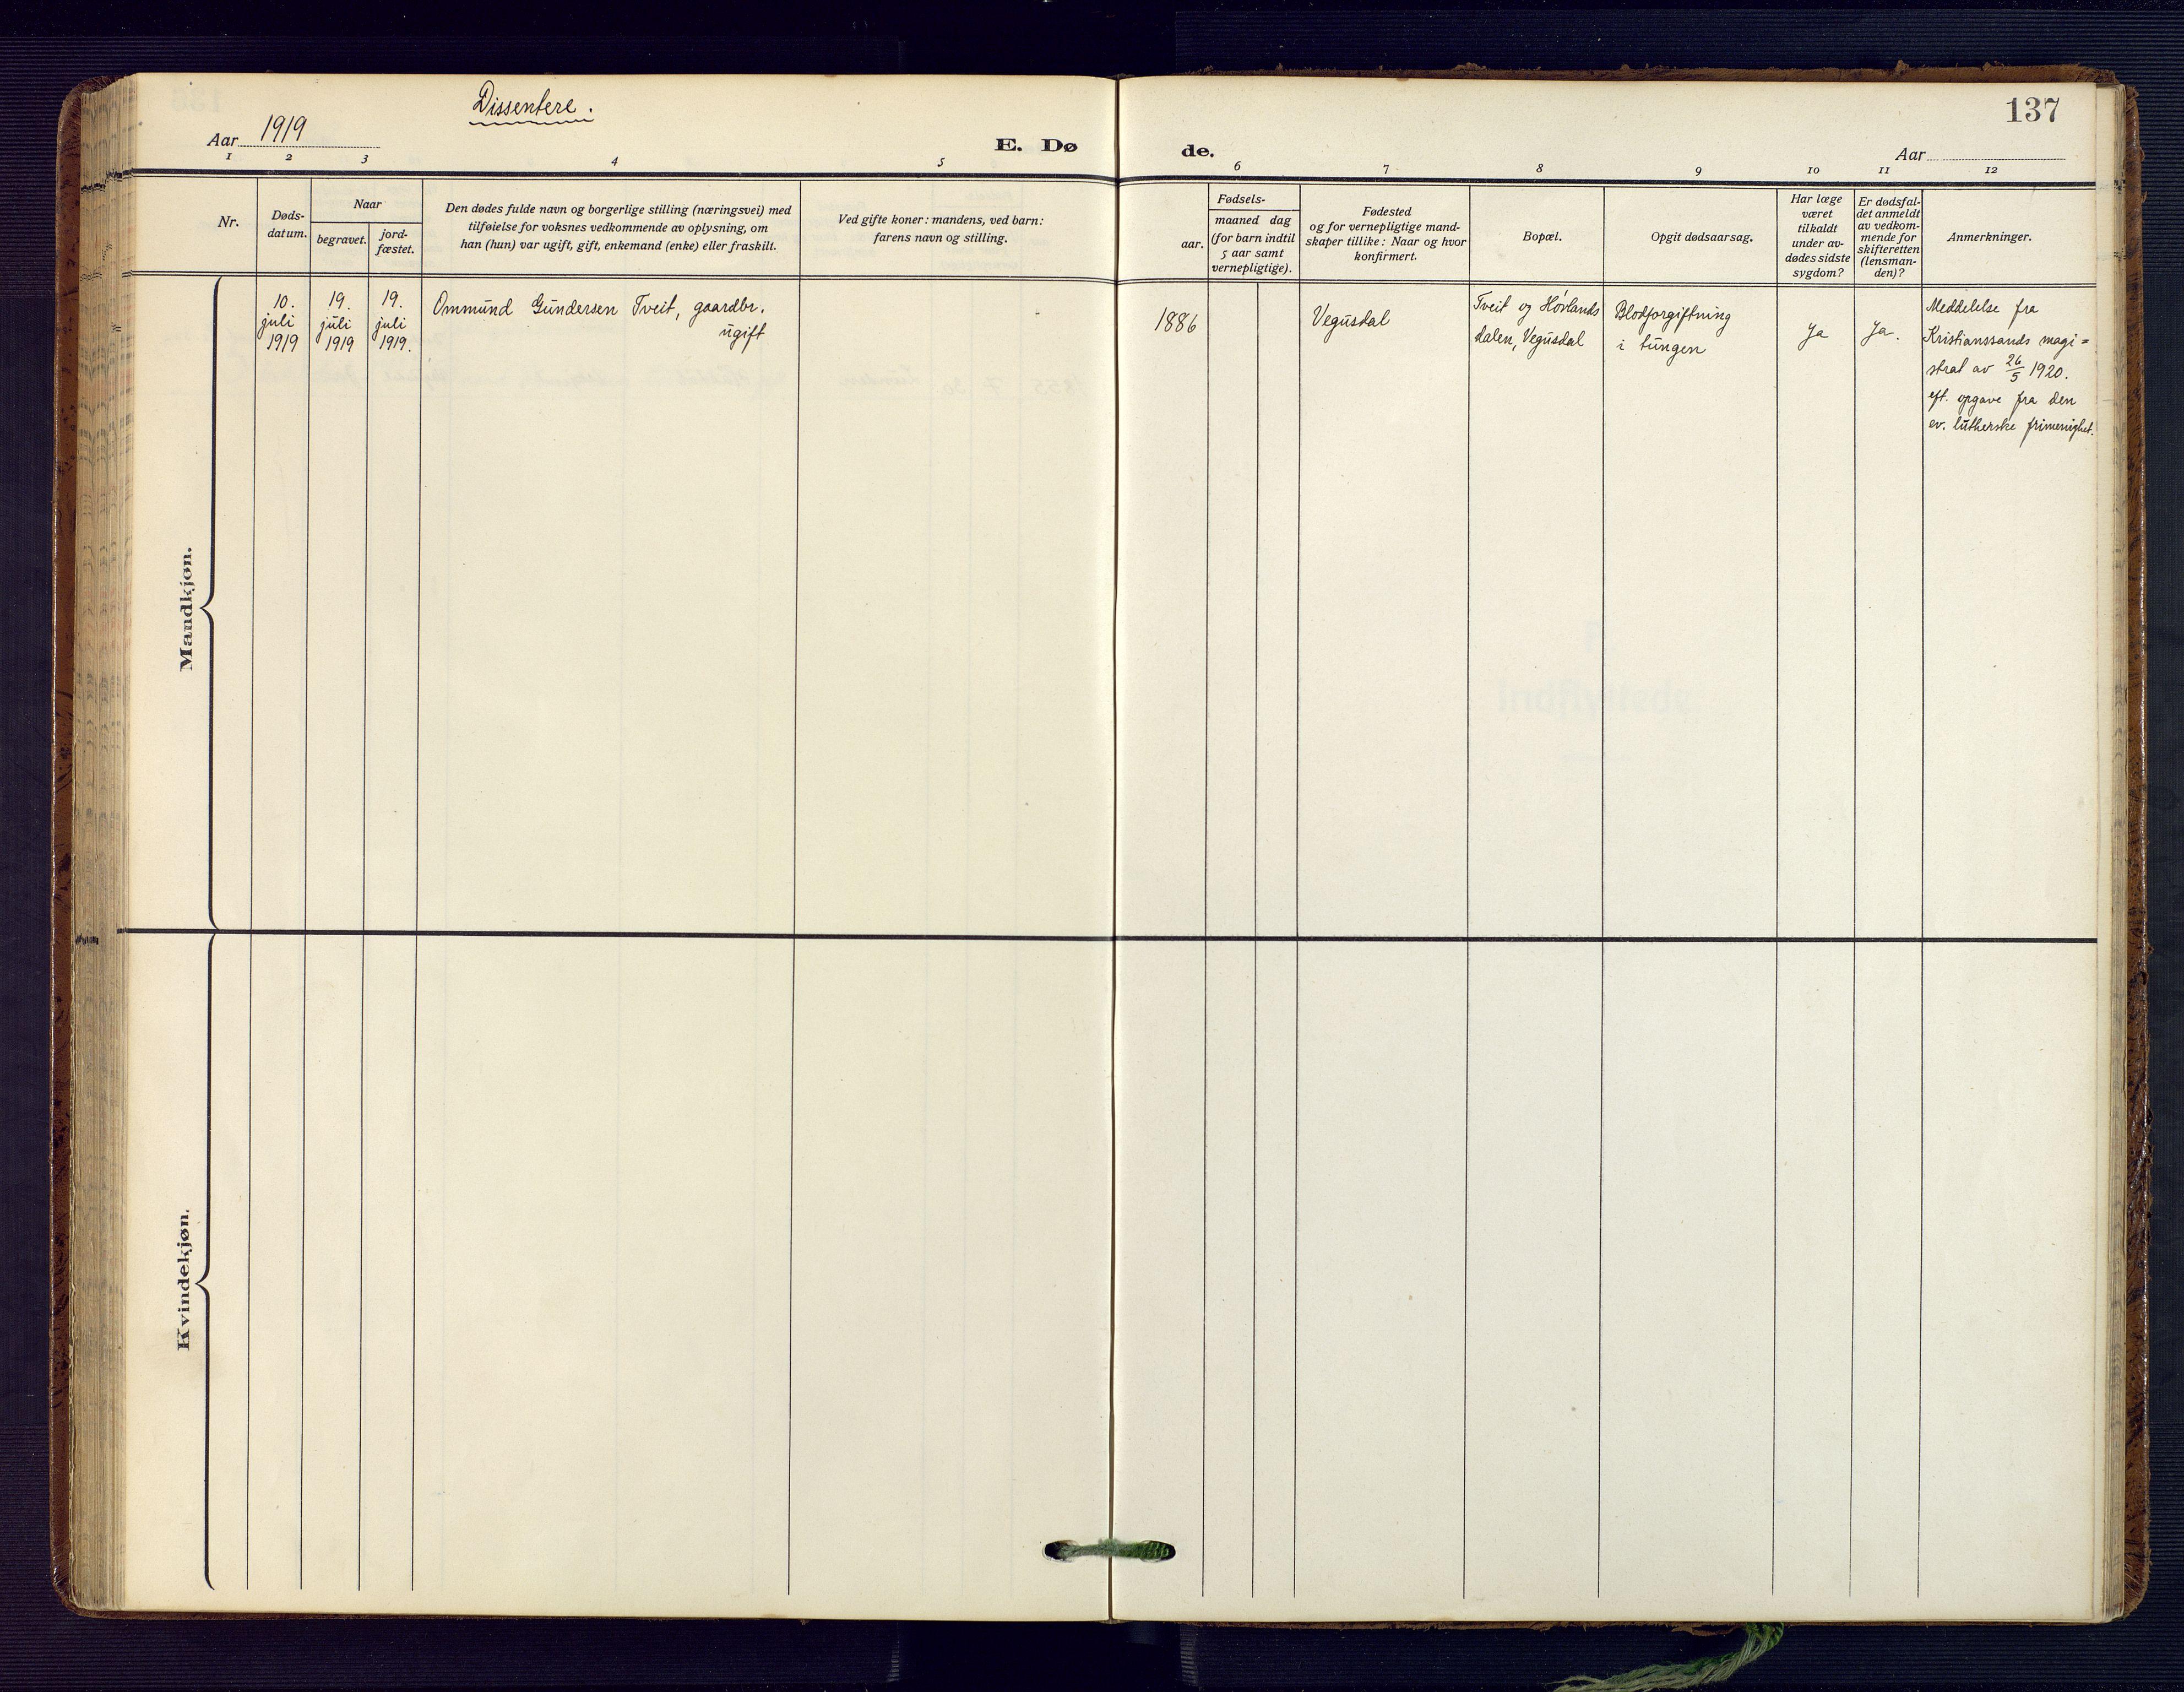 SAK, Herefoss sokneprestkontor, F/Fa/Fab/L0005: Ministerialbok nr. A 5, 1910-1932, s. 137